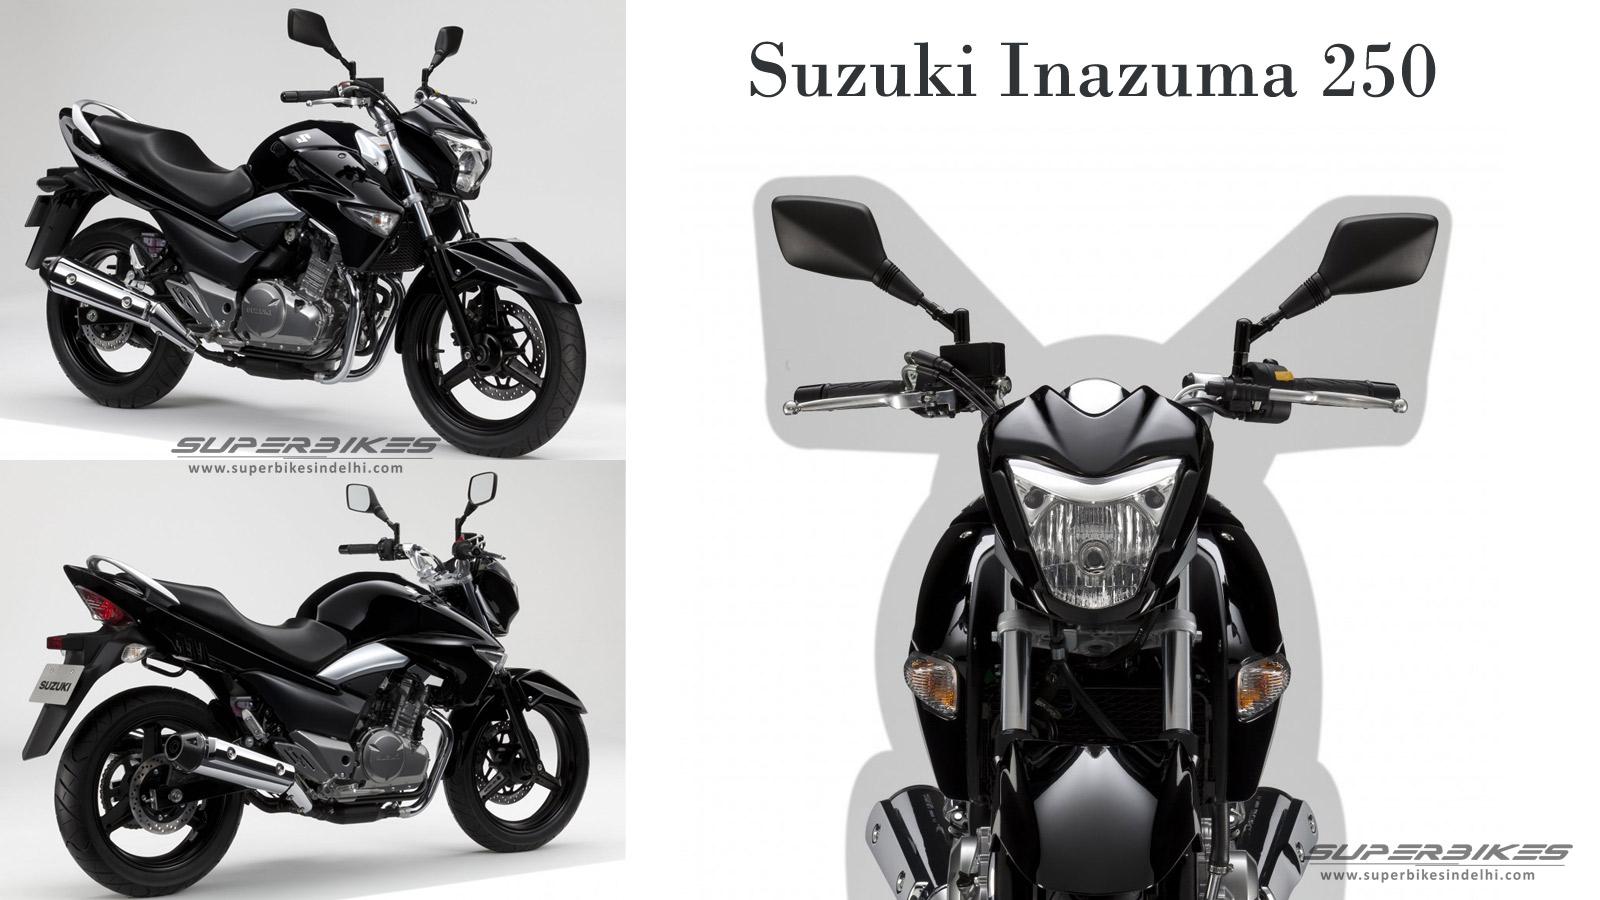 Harga Suzuki Inazuma 250 :: Spesifikasi Suzuki Inazuma 250